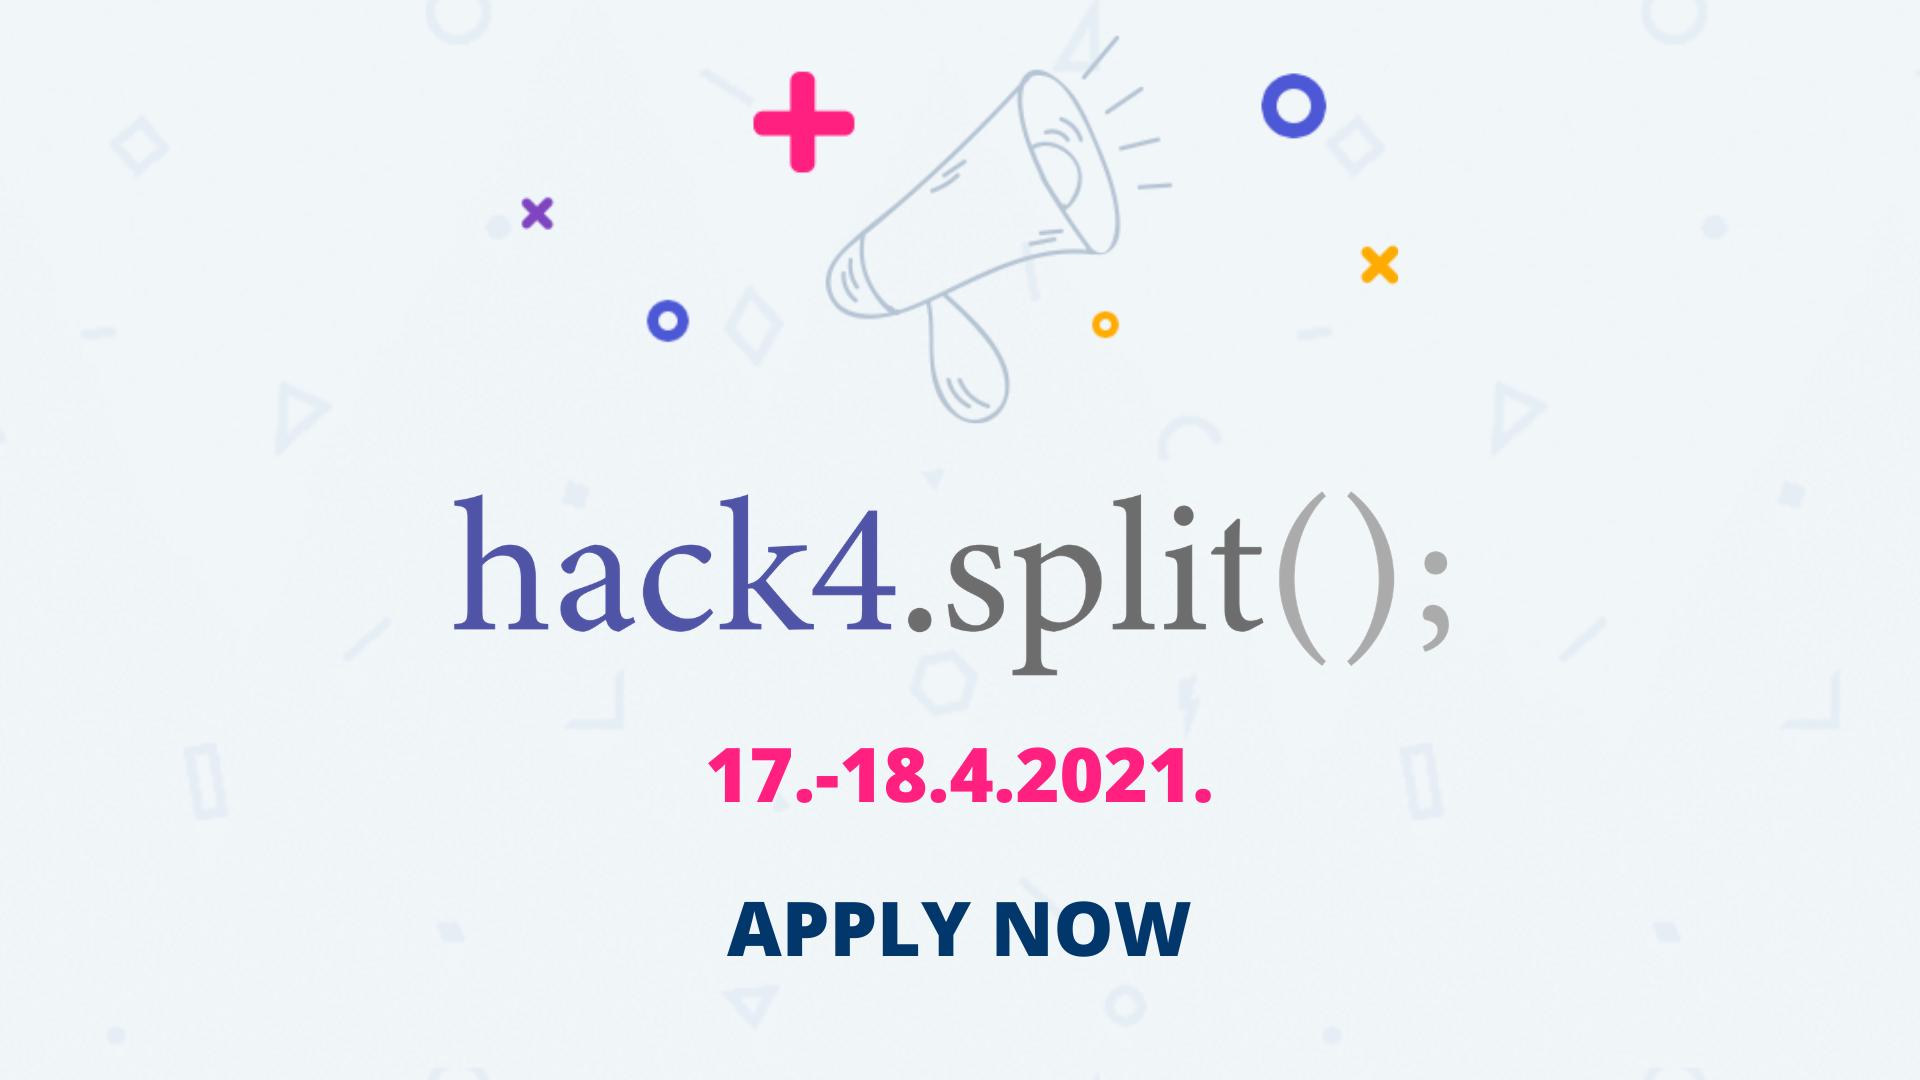 Hack4Split hackathon